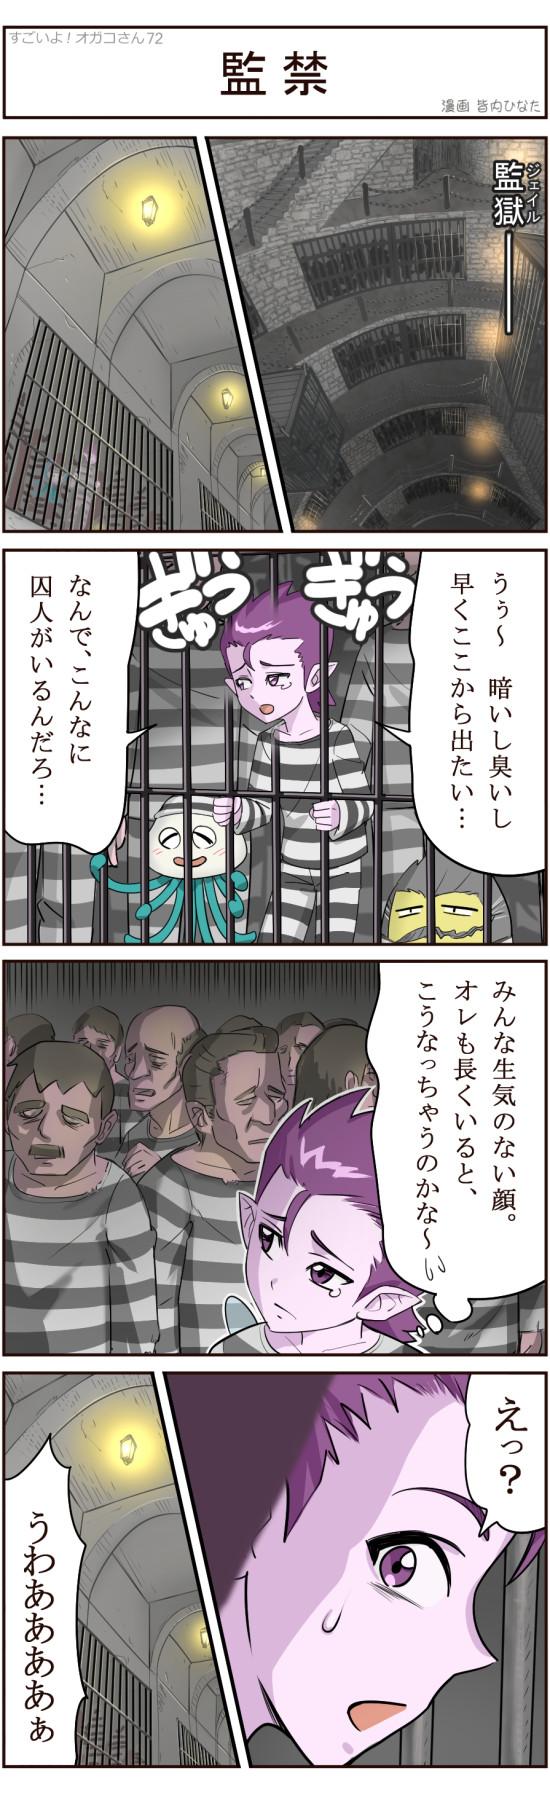 DQX4コマ漫画すごいよ!オガコさん第72話「監禁」皆内ひなた